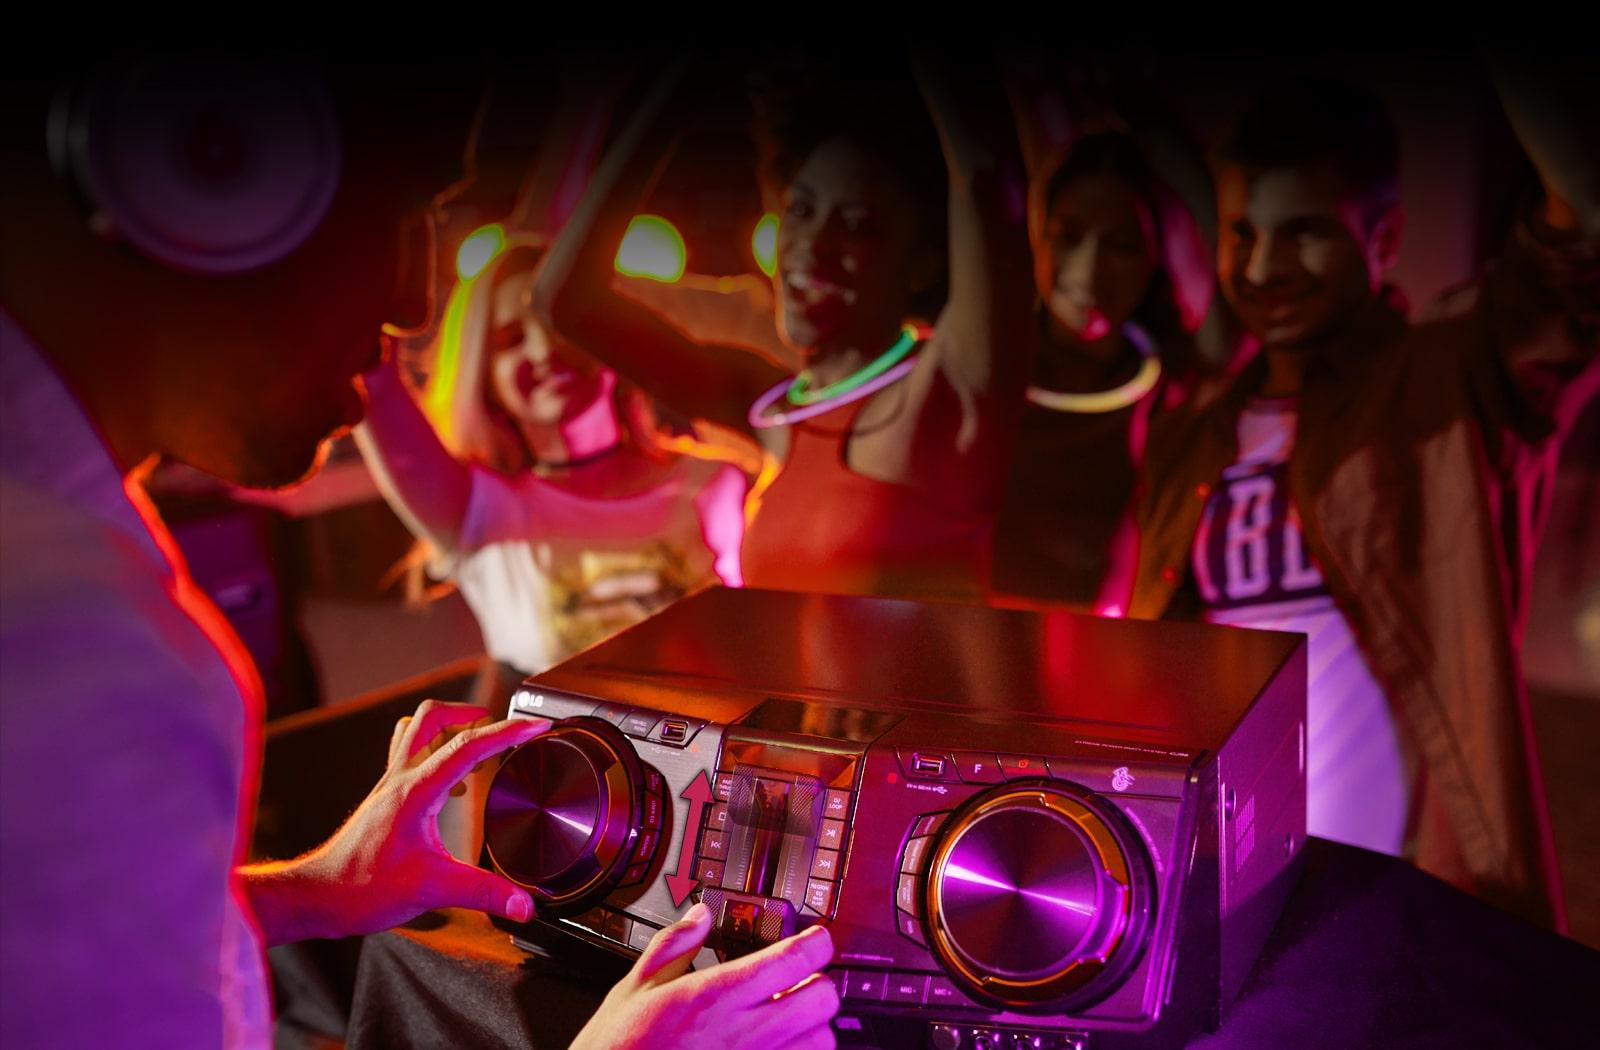 02_CJ98_Party Thruster_desk